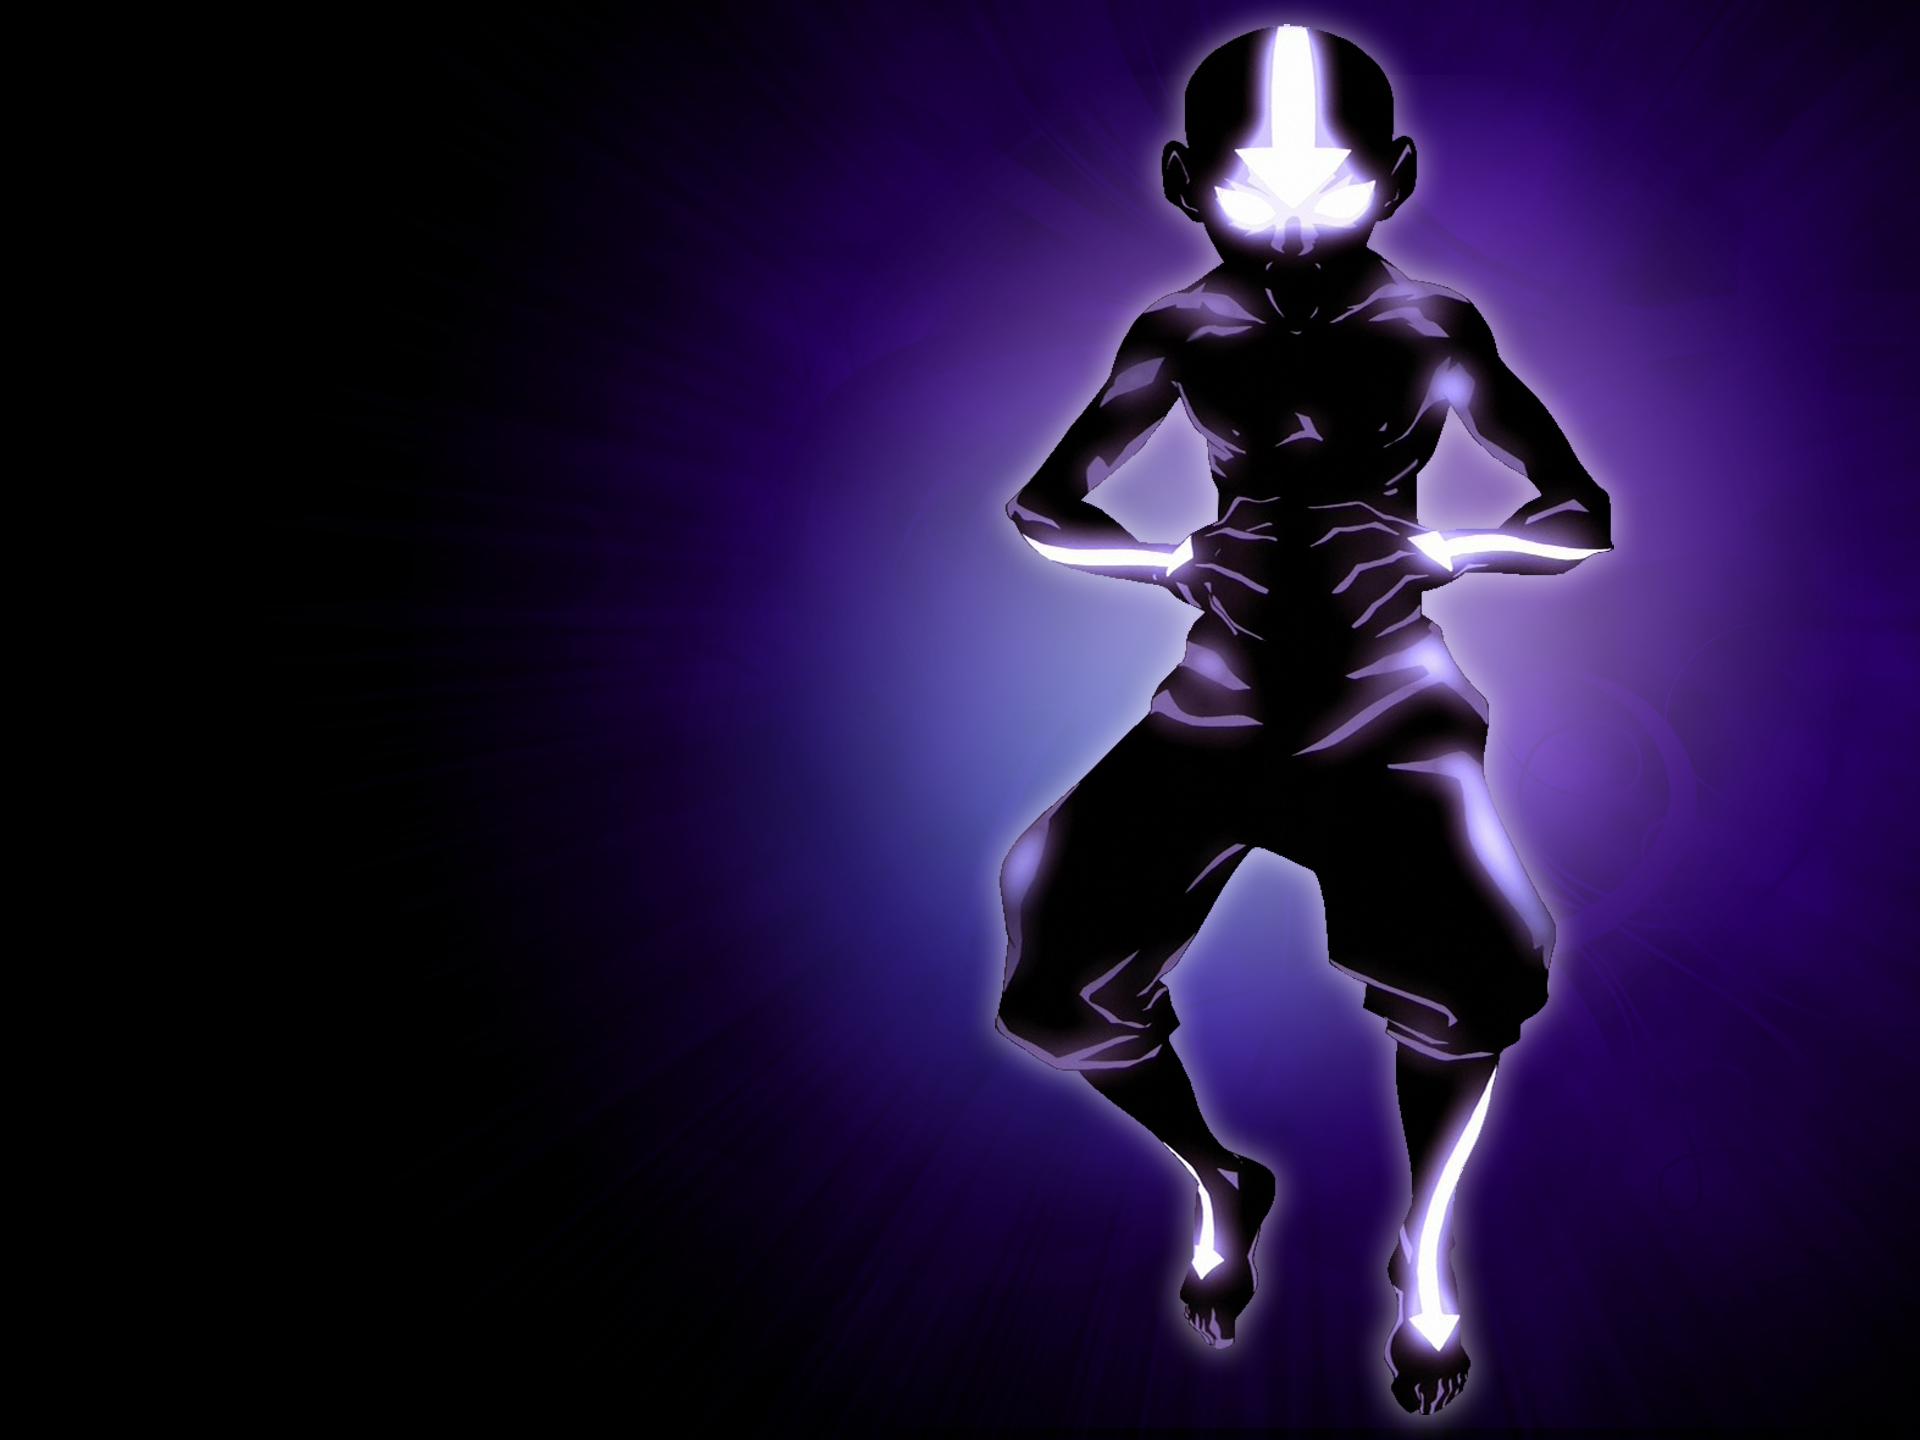 Avatar Aang Wallpaper 8 Anime Background Animewp Com